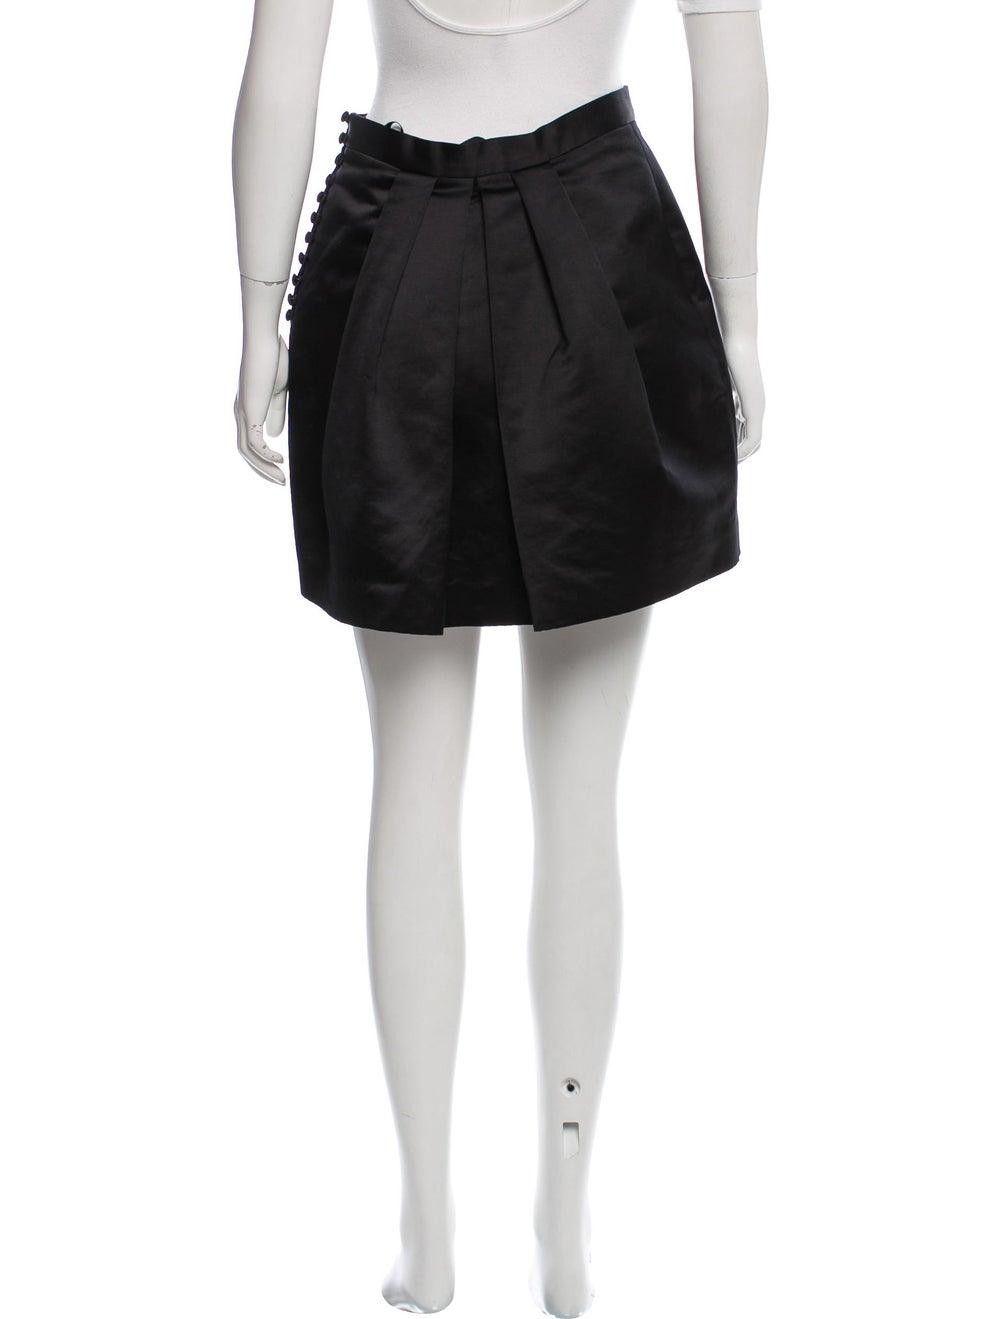 Acne Studios Satin Willow Skirt Black - image 3